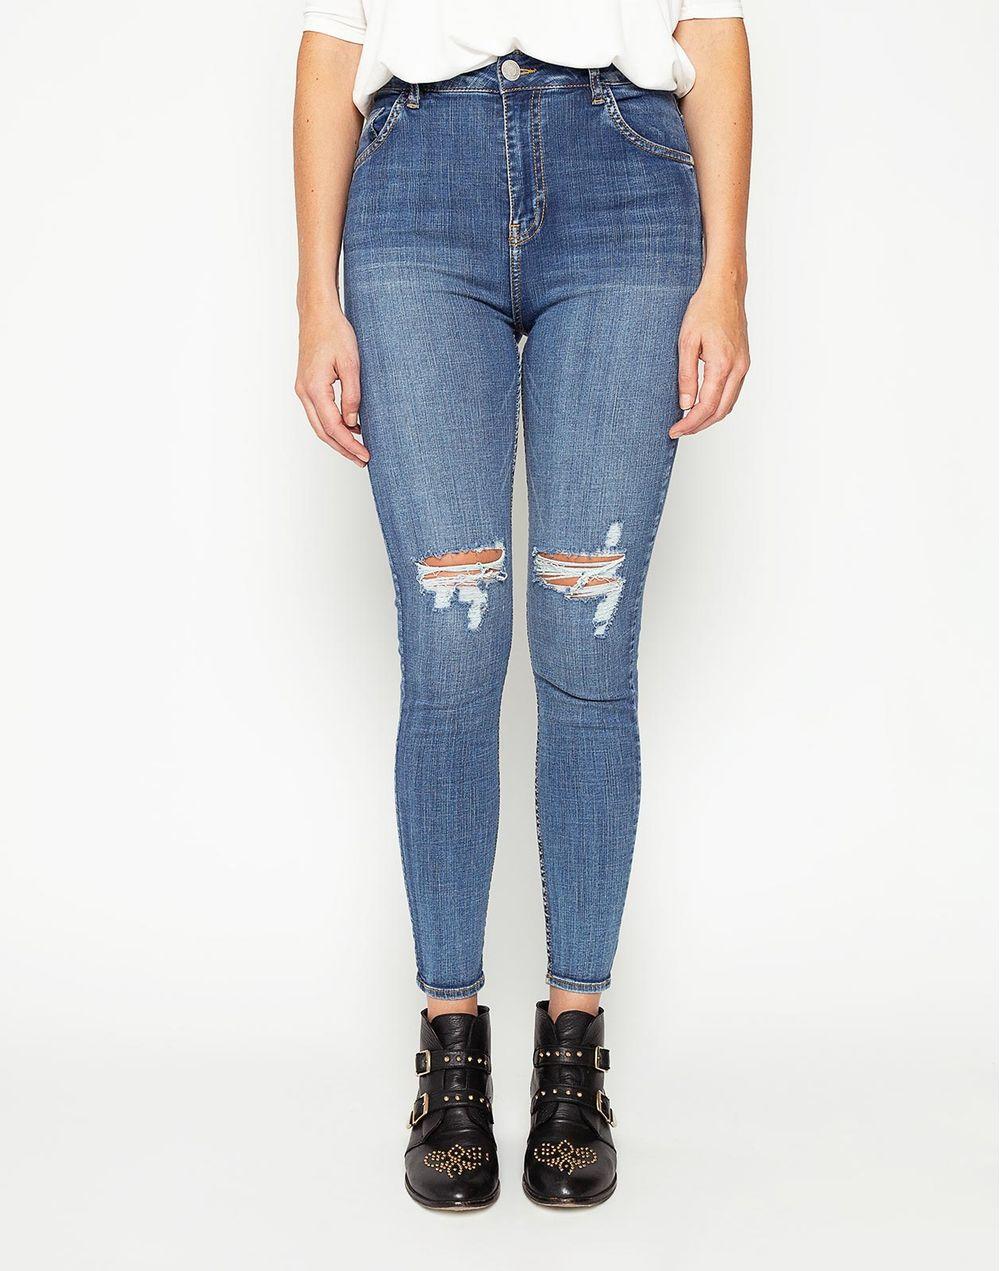 nueva llegada 58a1e 099ad High Waist Denim Jeans Rotos En Rodilla